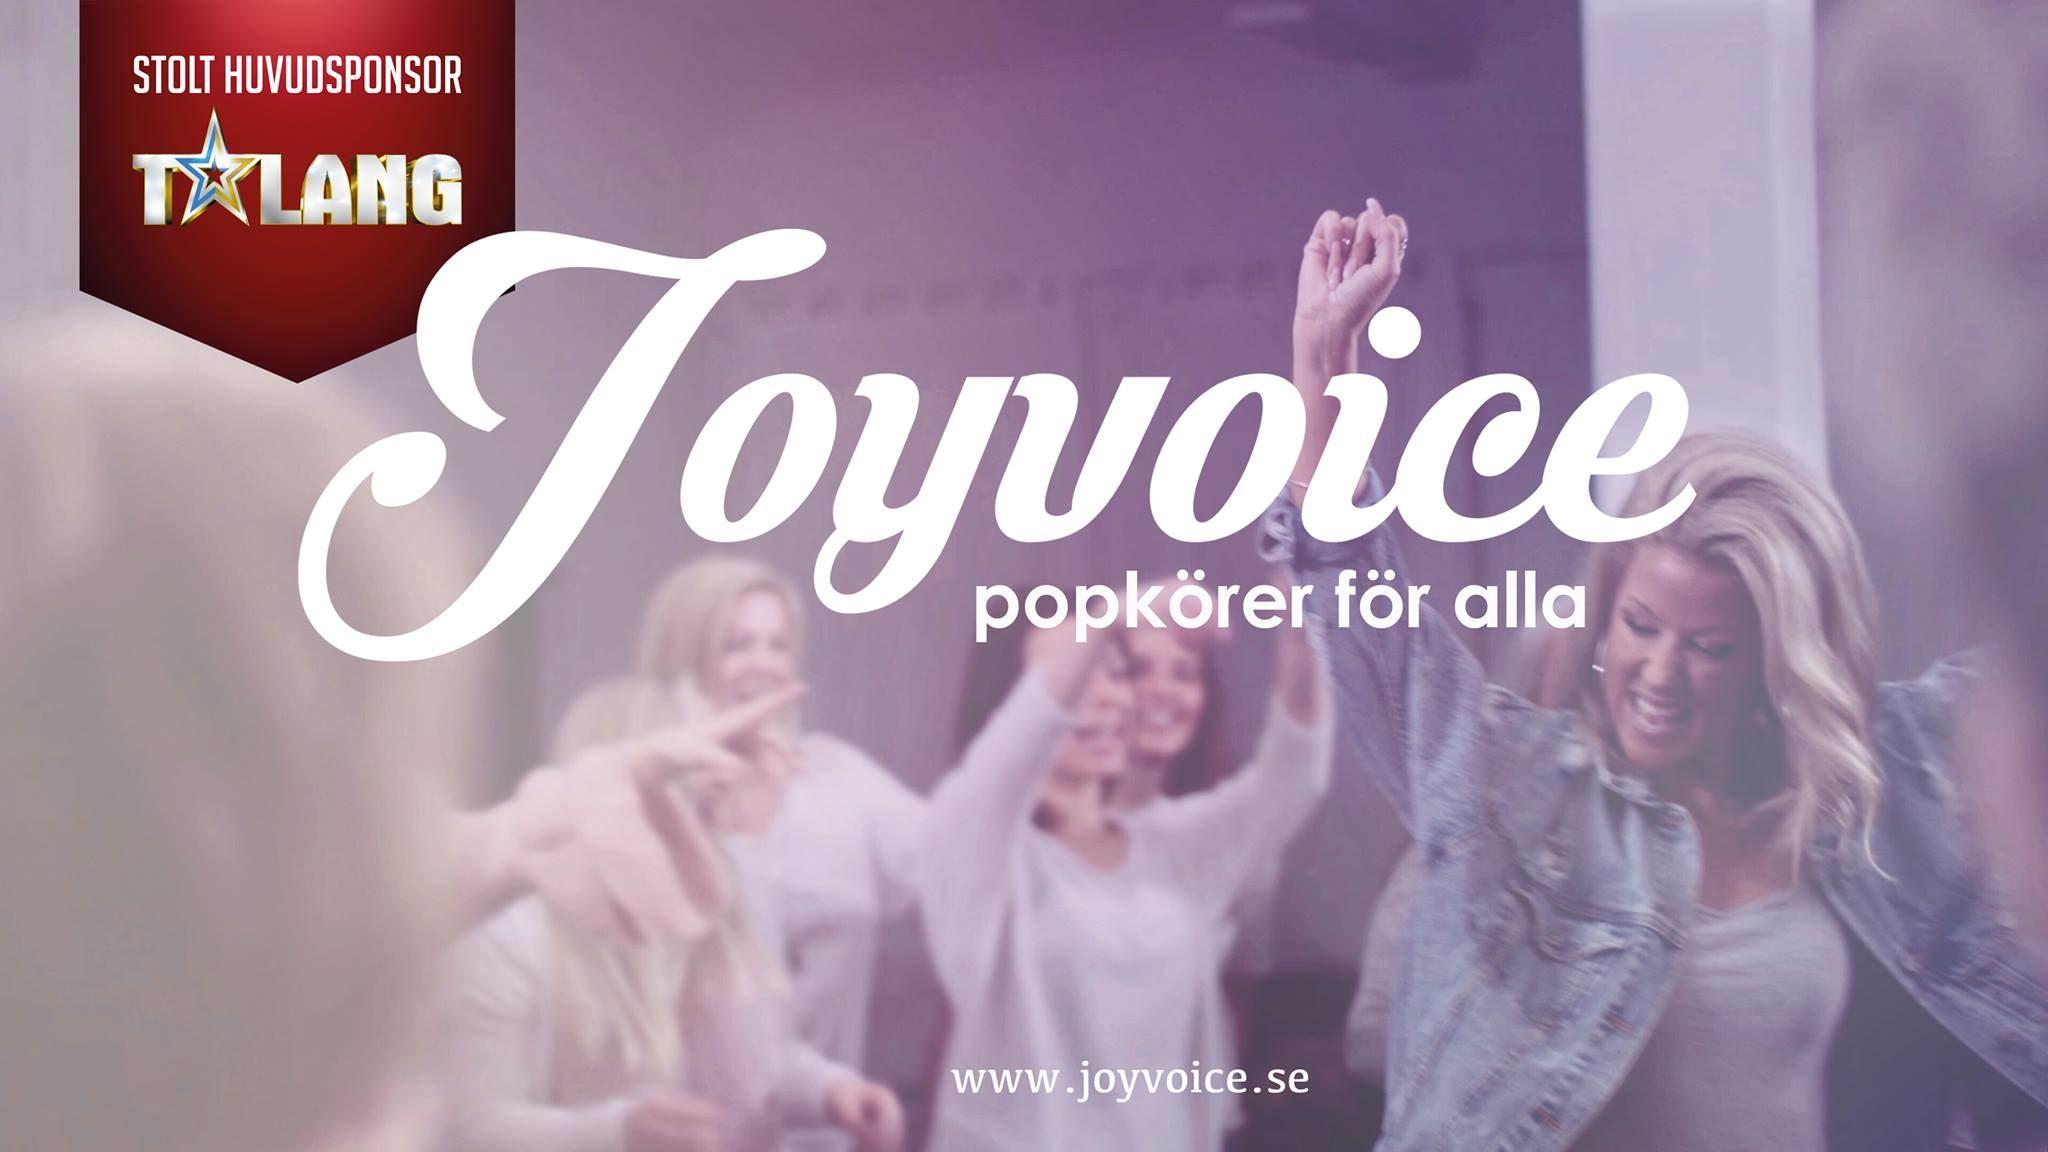 Joyvoice, popkörer för alla,  © Joyvoice, popkörer för alla, Joyvoice, popkörer för alla